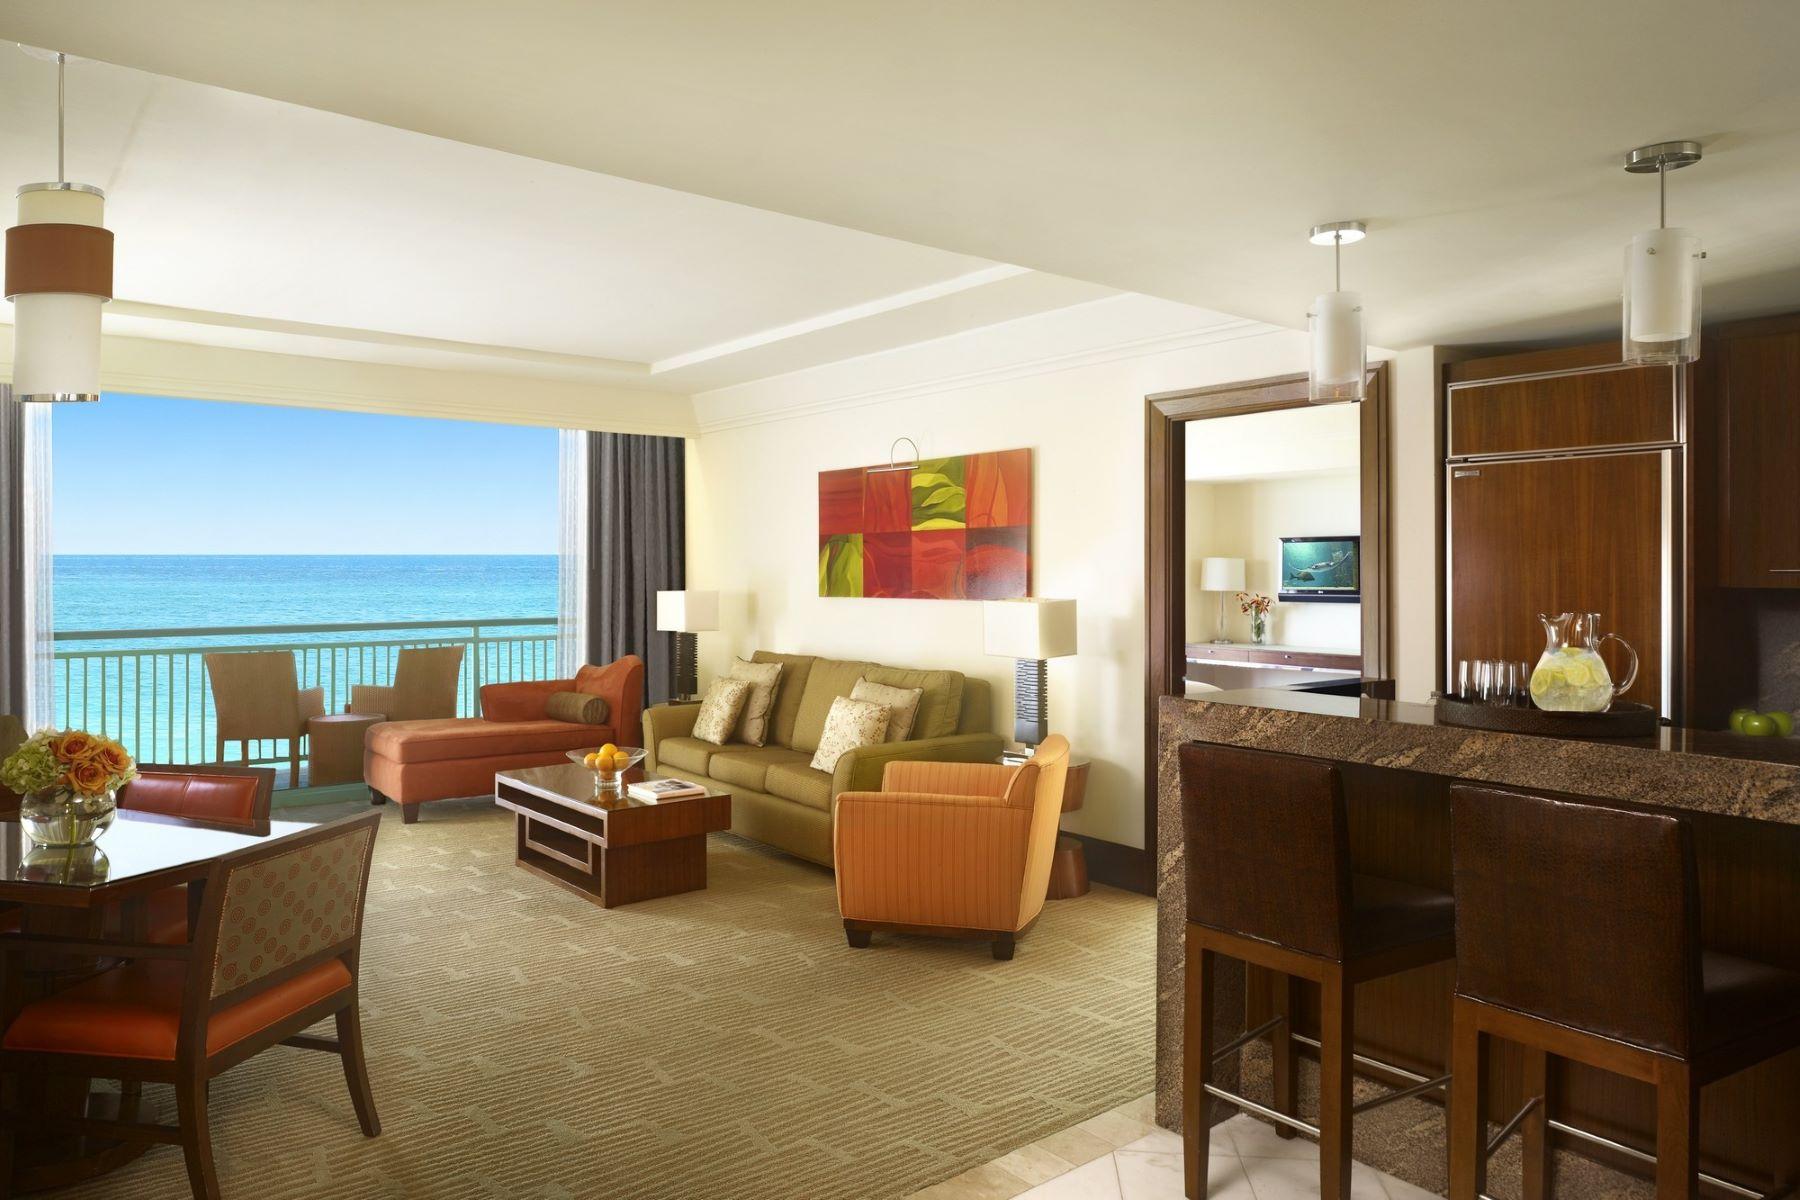 Condominium for Sale at The Reef 9-919 Paradise Island, Nassau And Paradise Island Bahamas